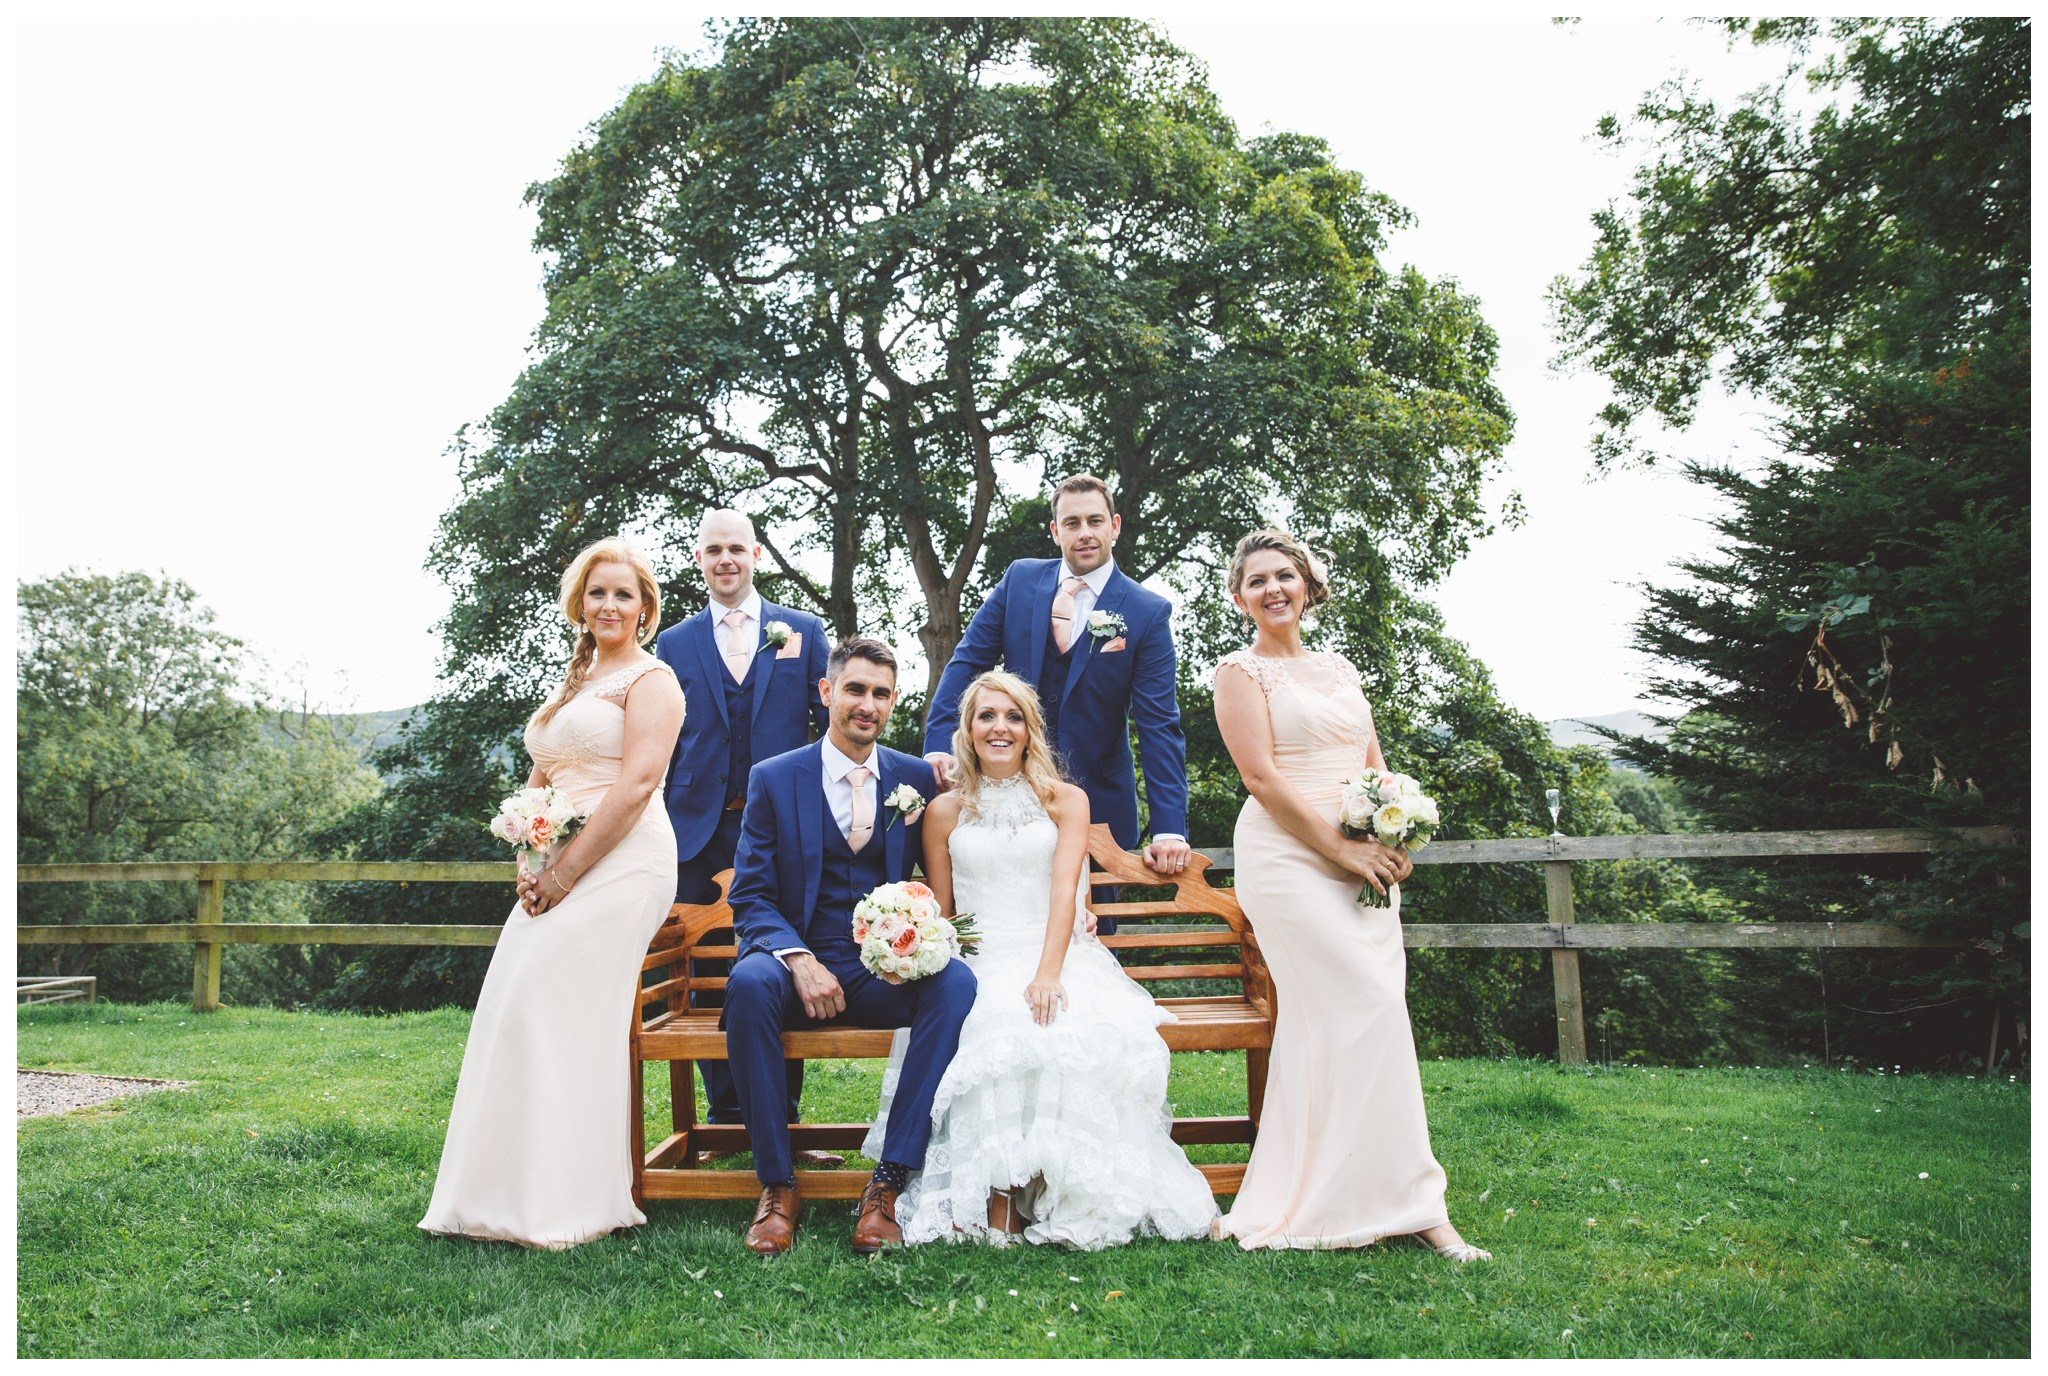 Richard Savage Photography - Wedding - Peterstone Court Brecon - 2016-05-11_0040